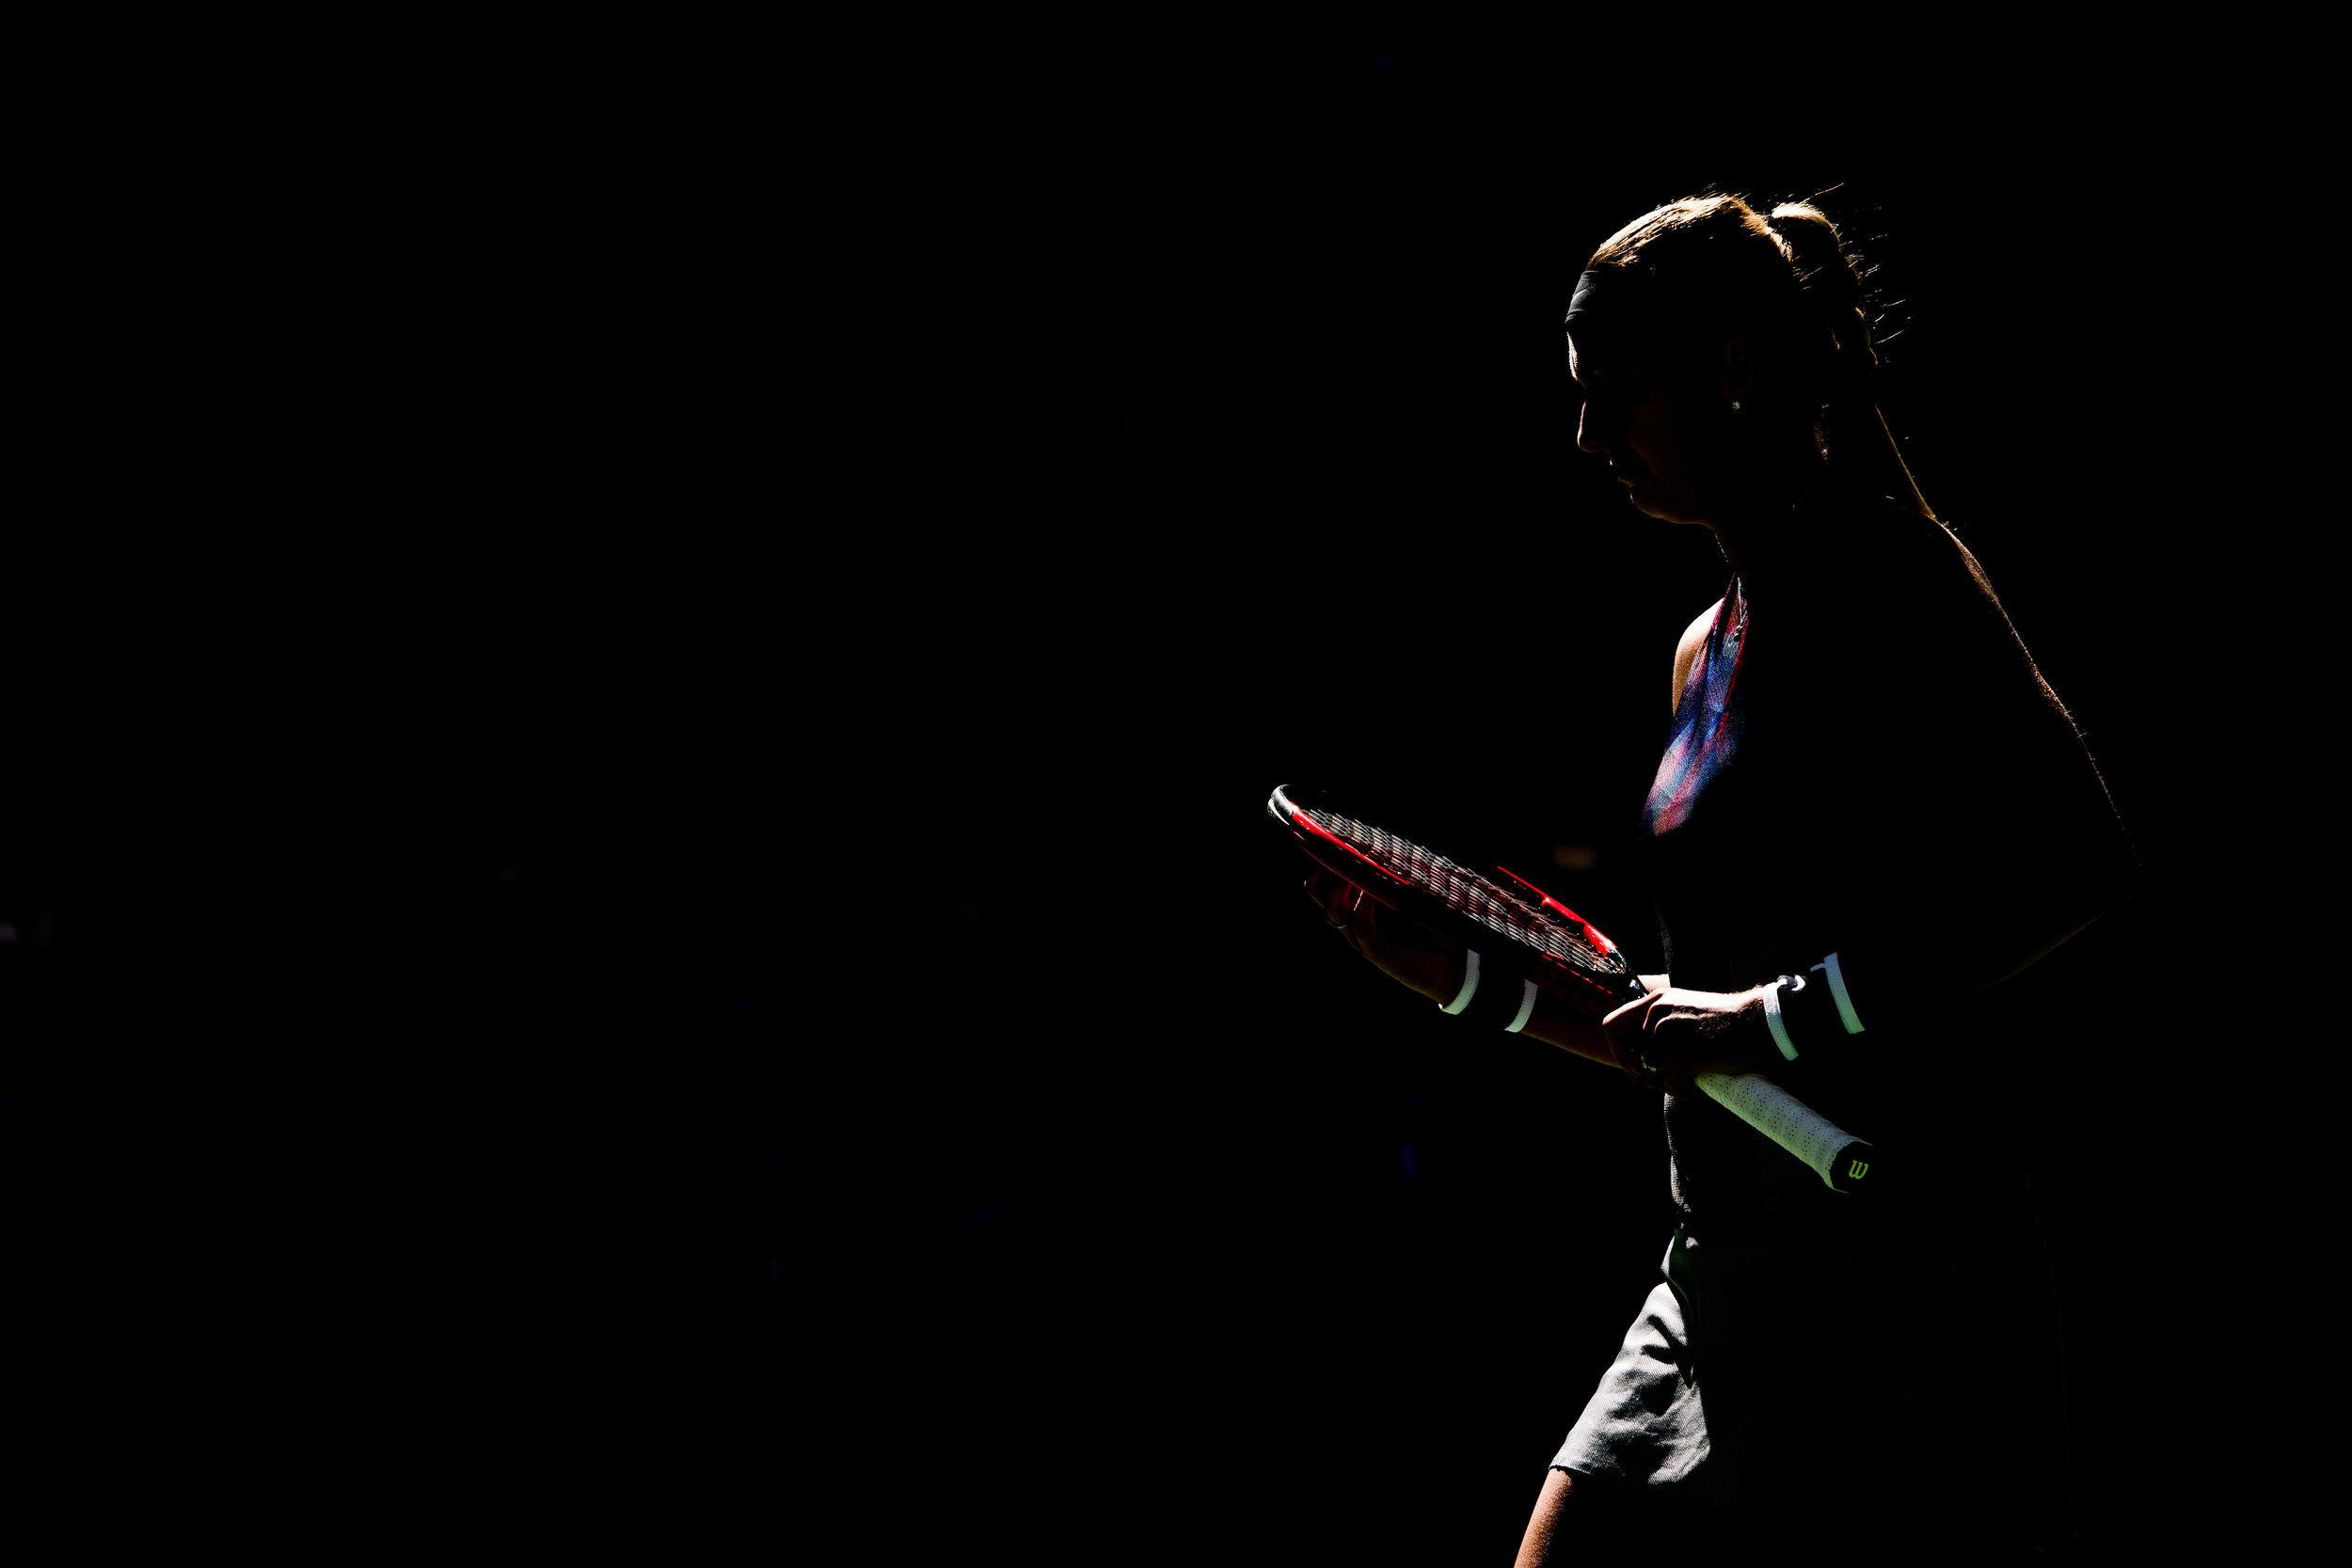 Petra Kvitova, 2017 U.S.Open. Queens, New York.  Sony A9, Sony 100-400mm f4.5-5.6 GM OSS